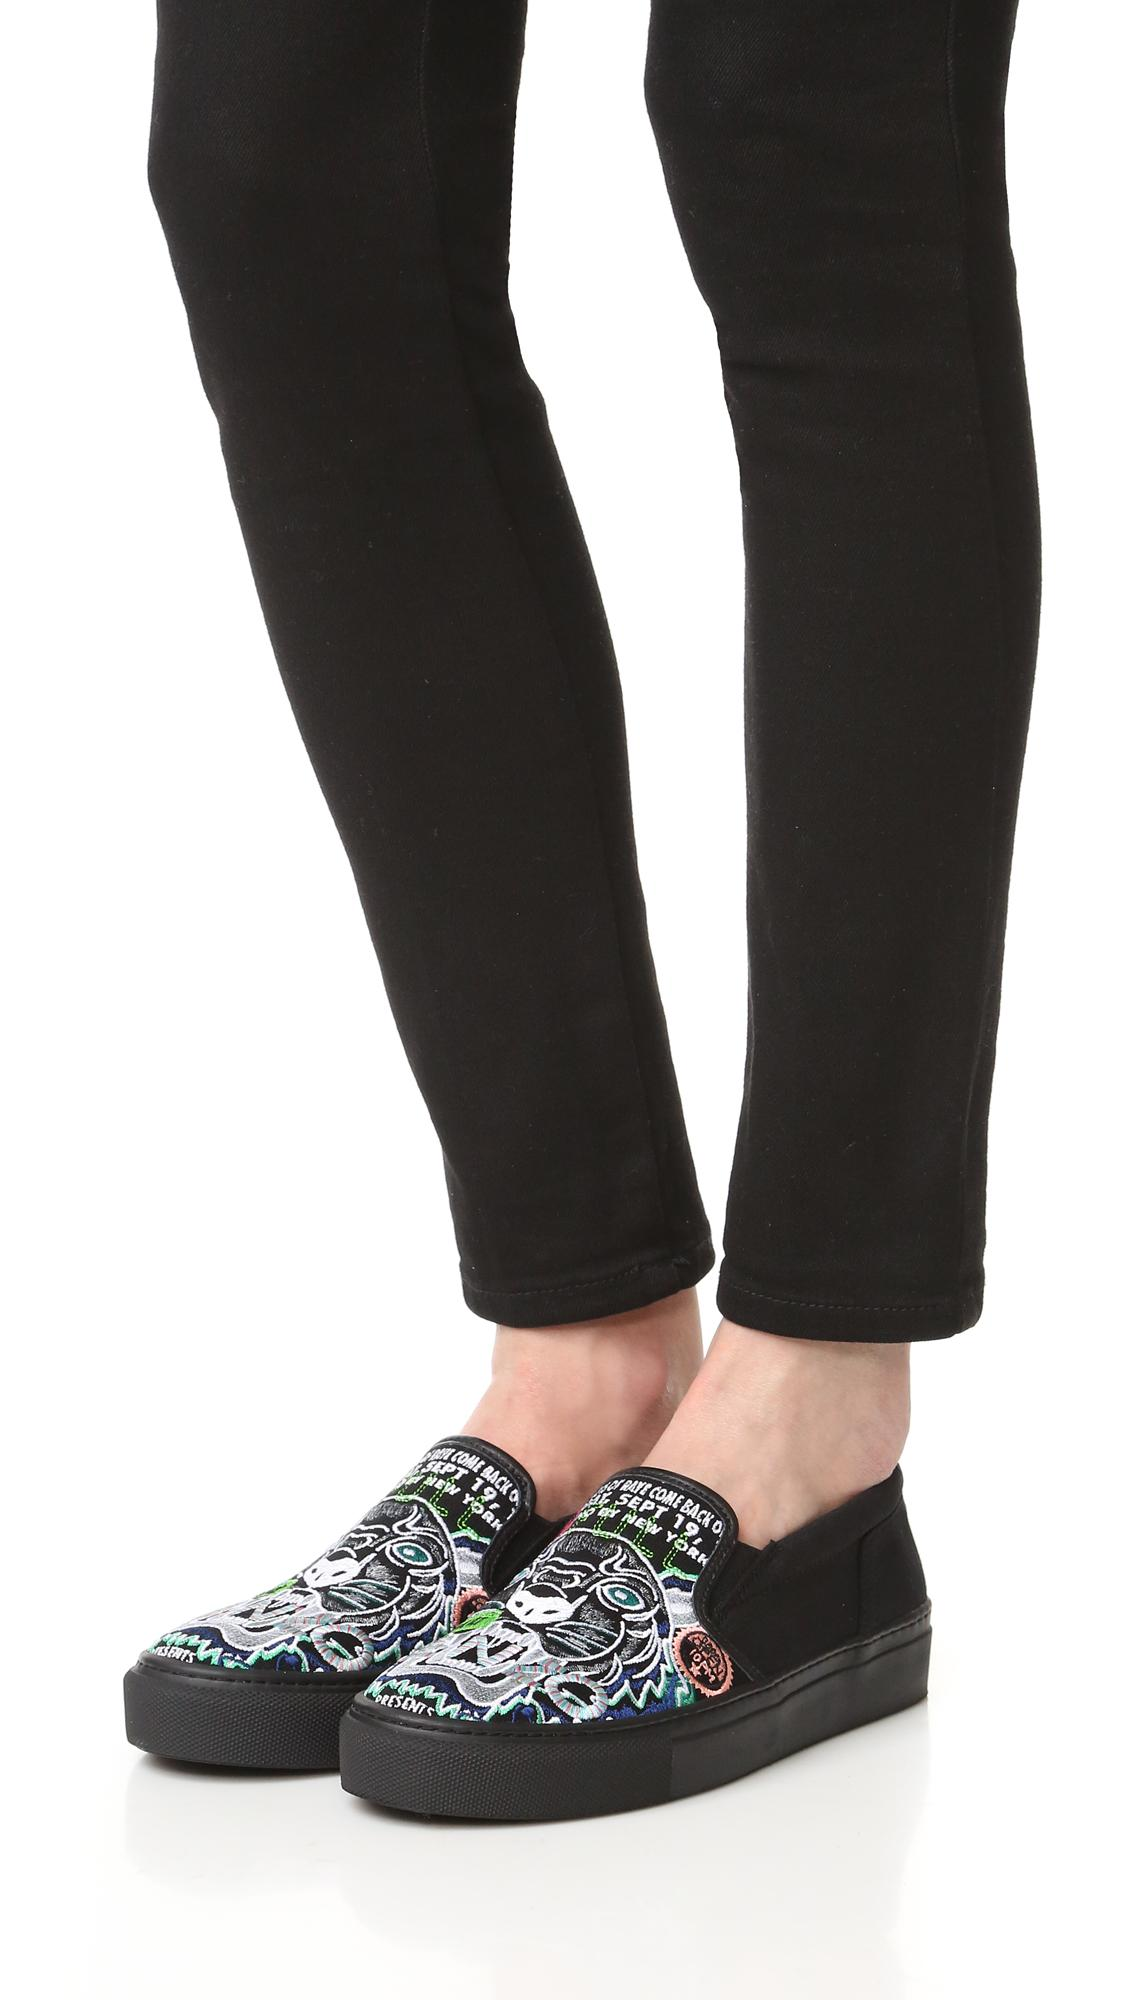 Kenzo Shoe Size Fit